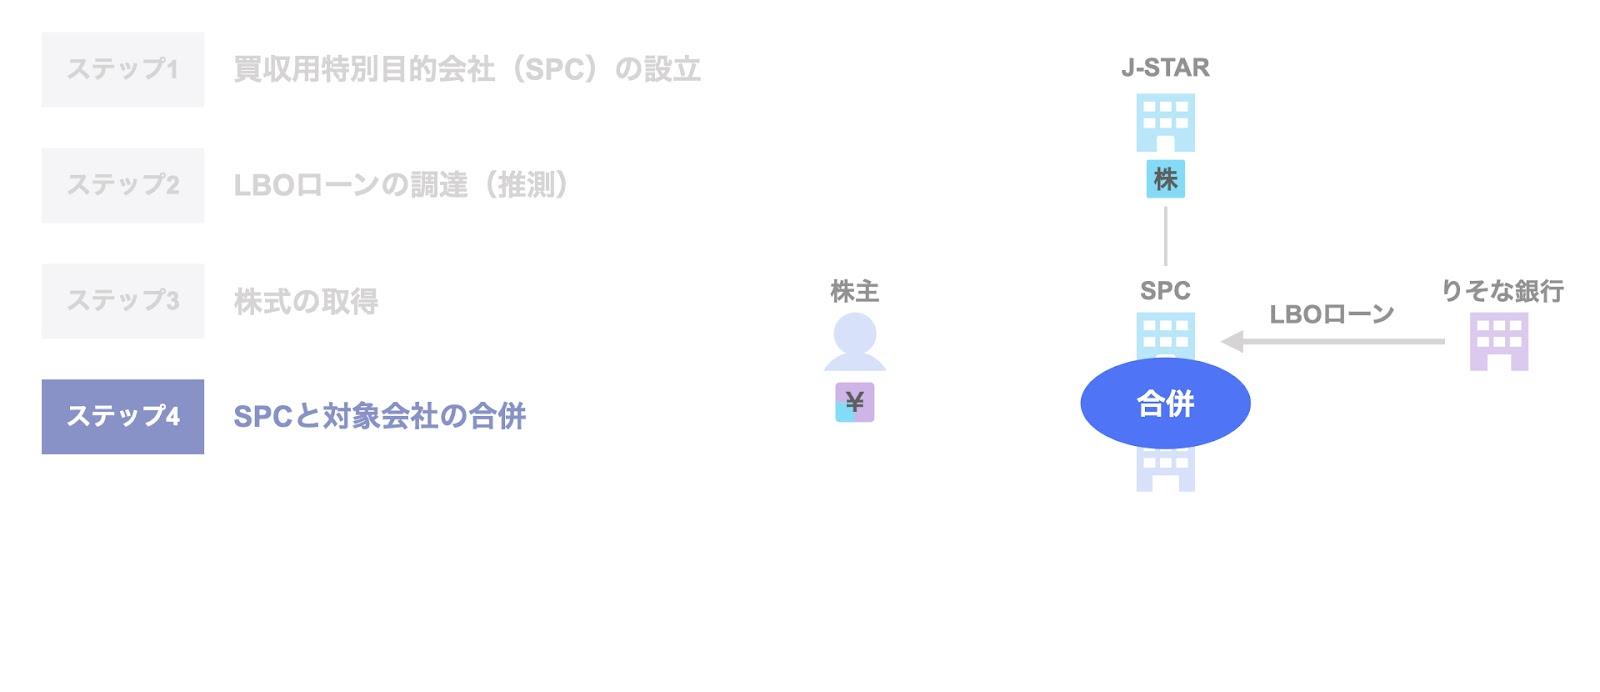 J-STARによるエスコのExit ステップ4. SPCと対象会社の合併